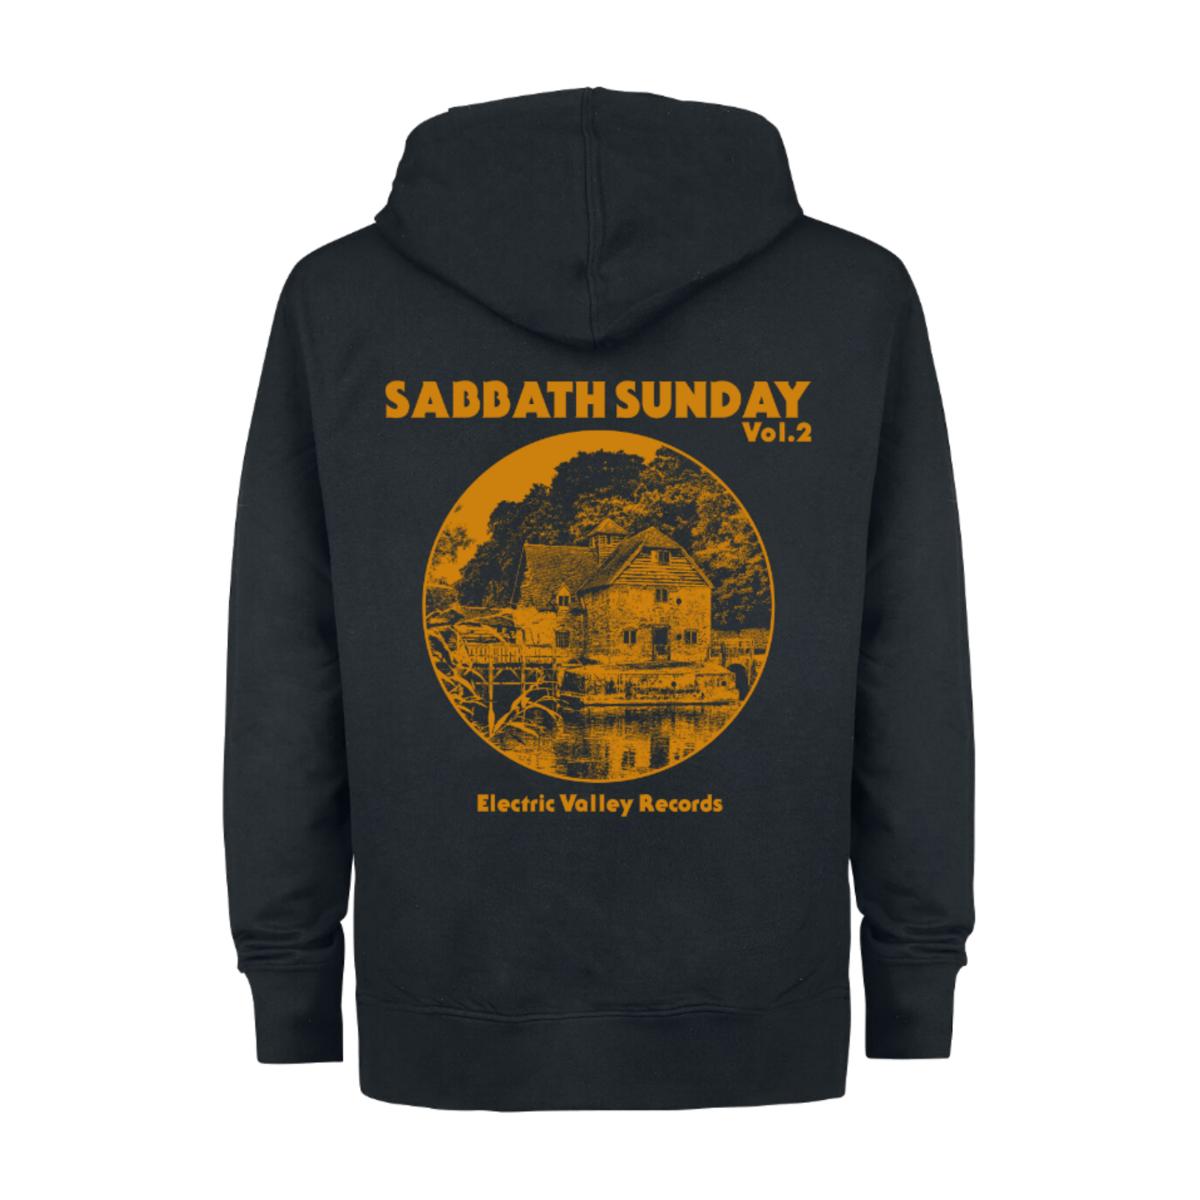 Image of Sabbath Sunday Zip Hoodie